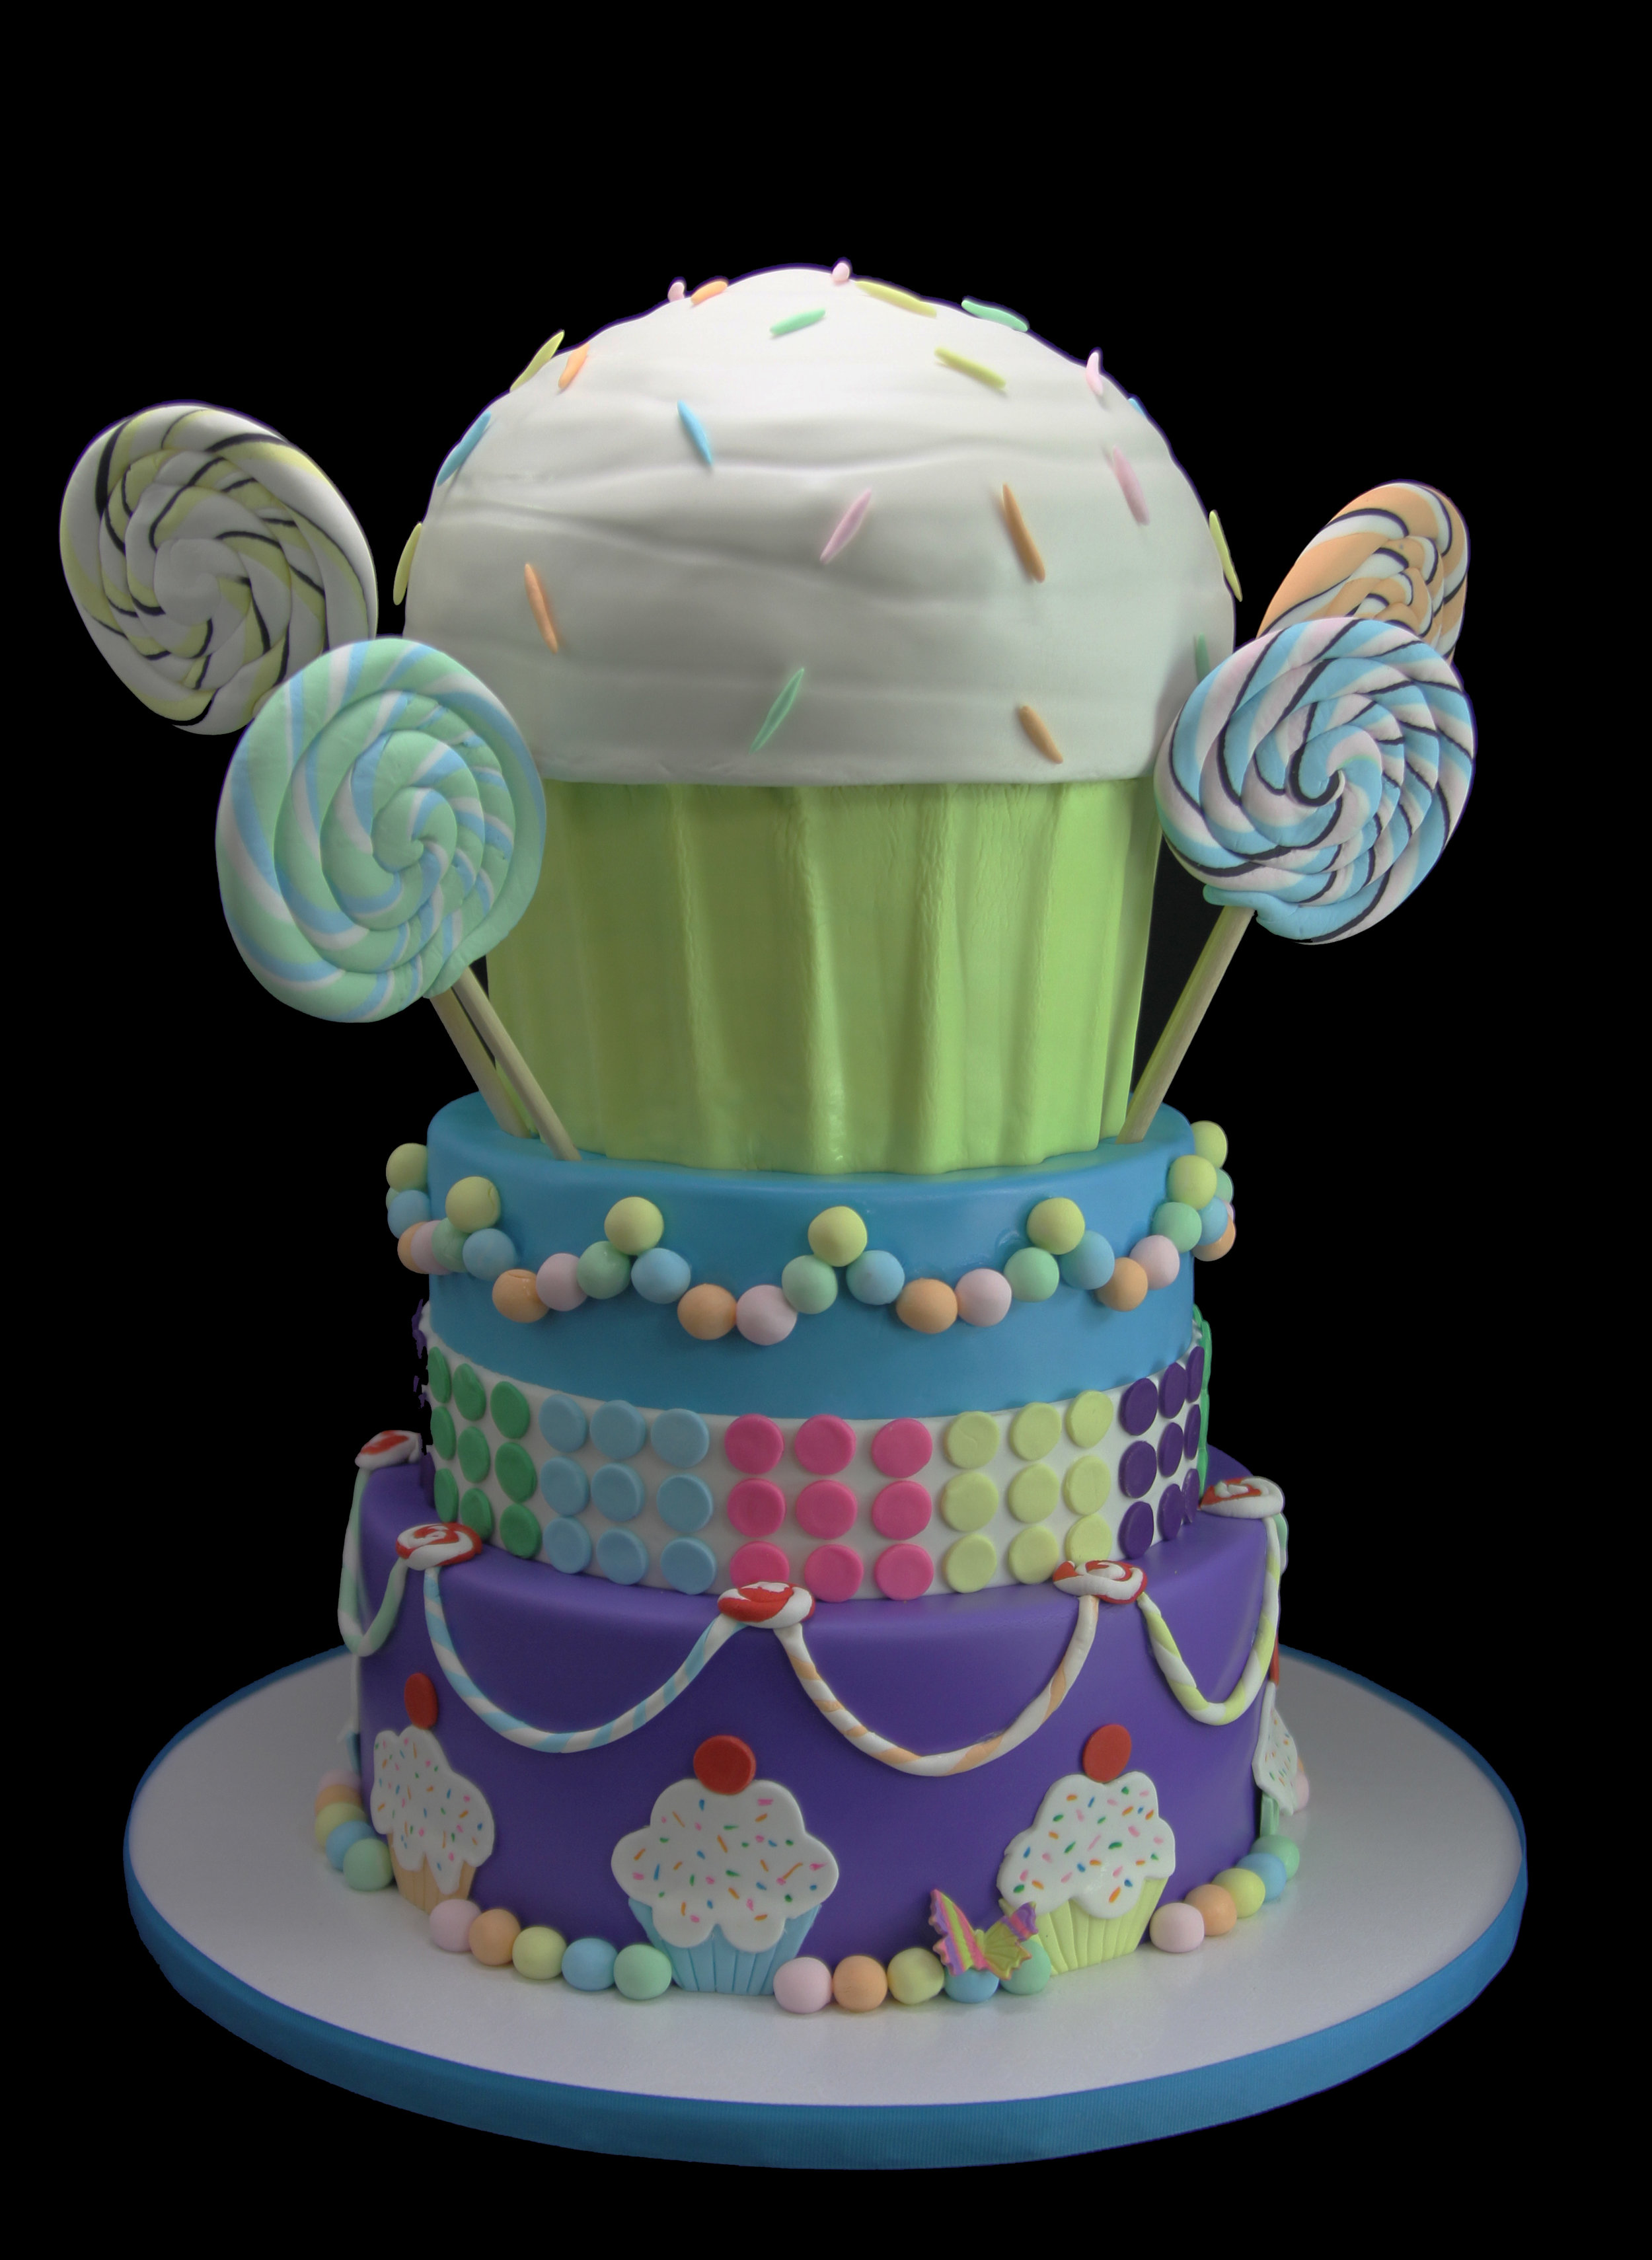 Candyland Theme Cake.jpg